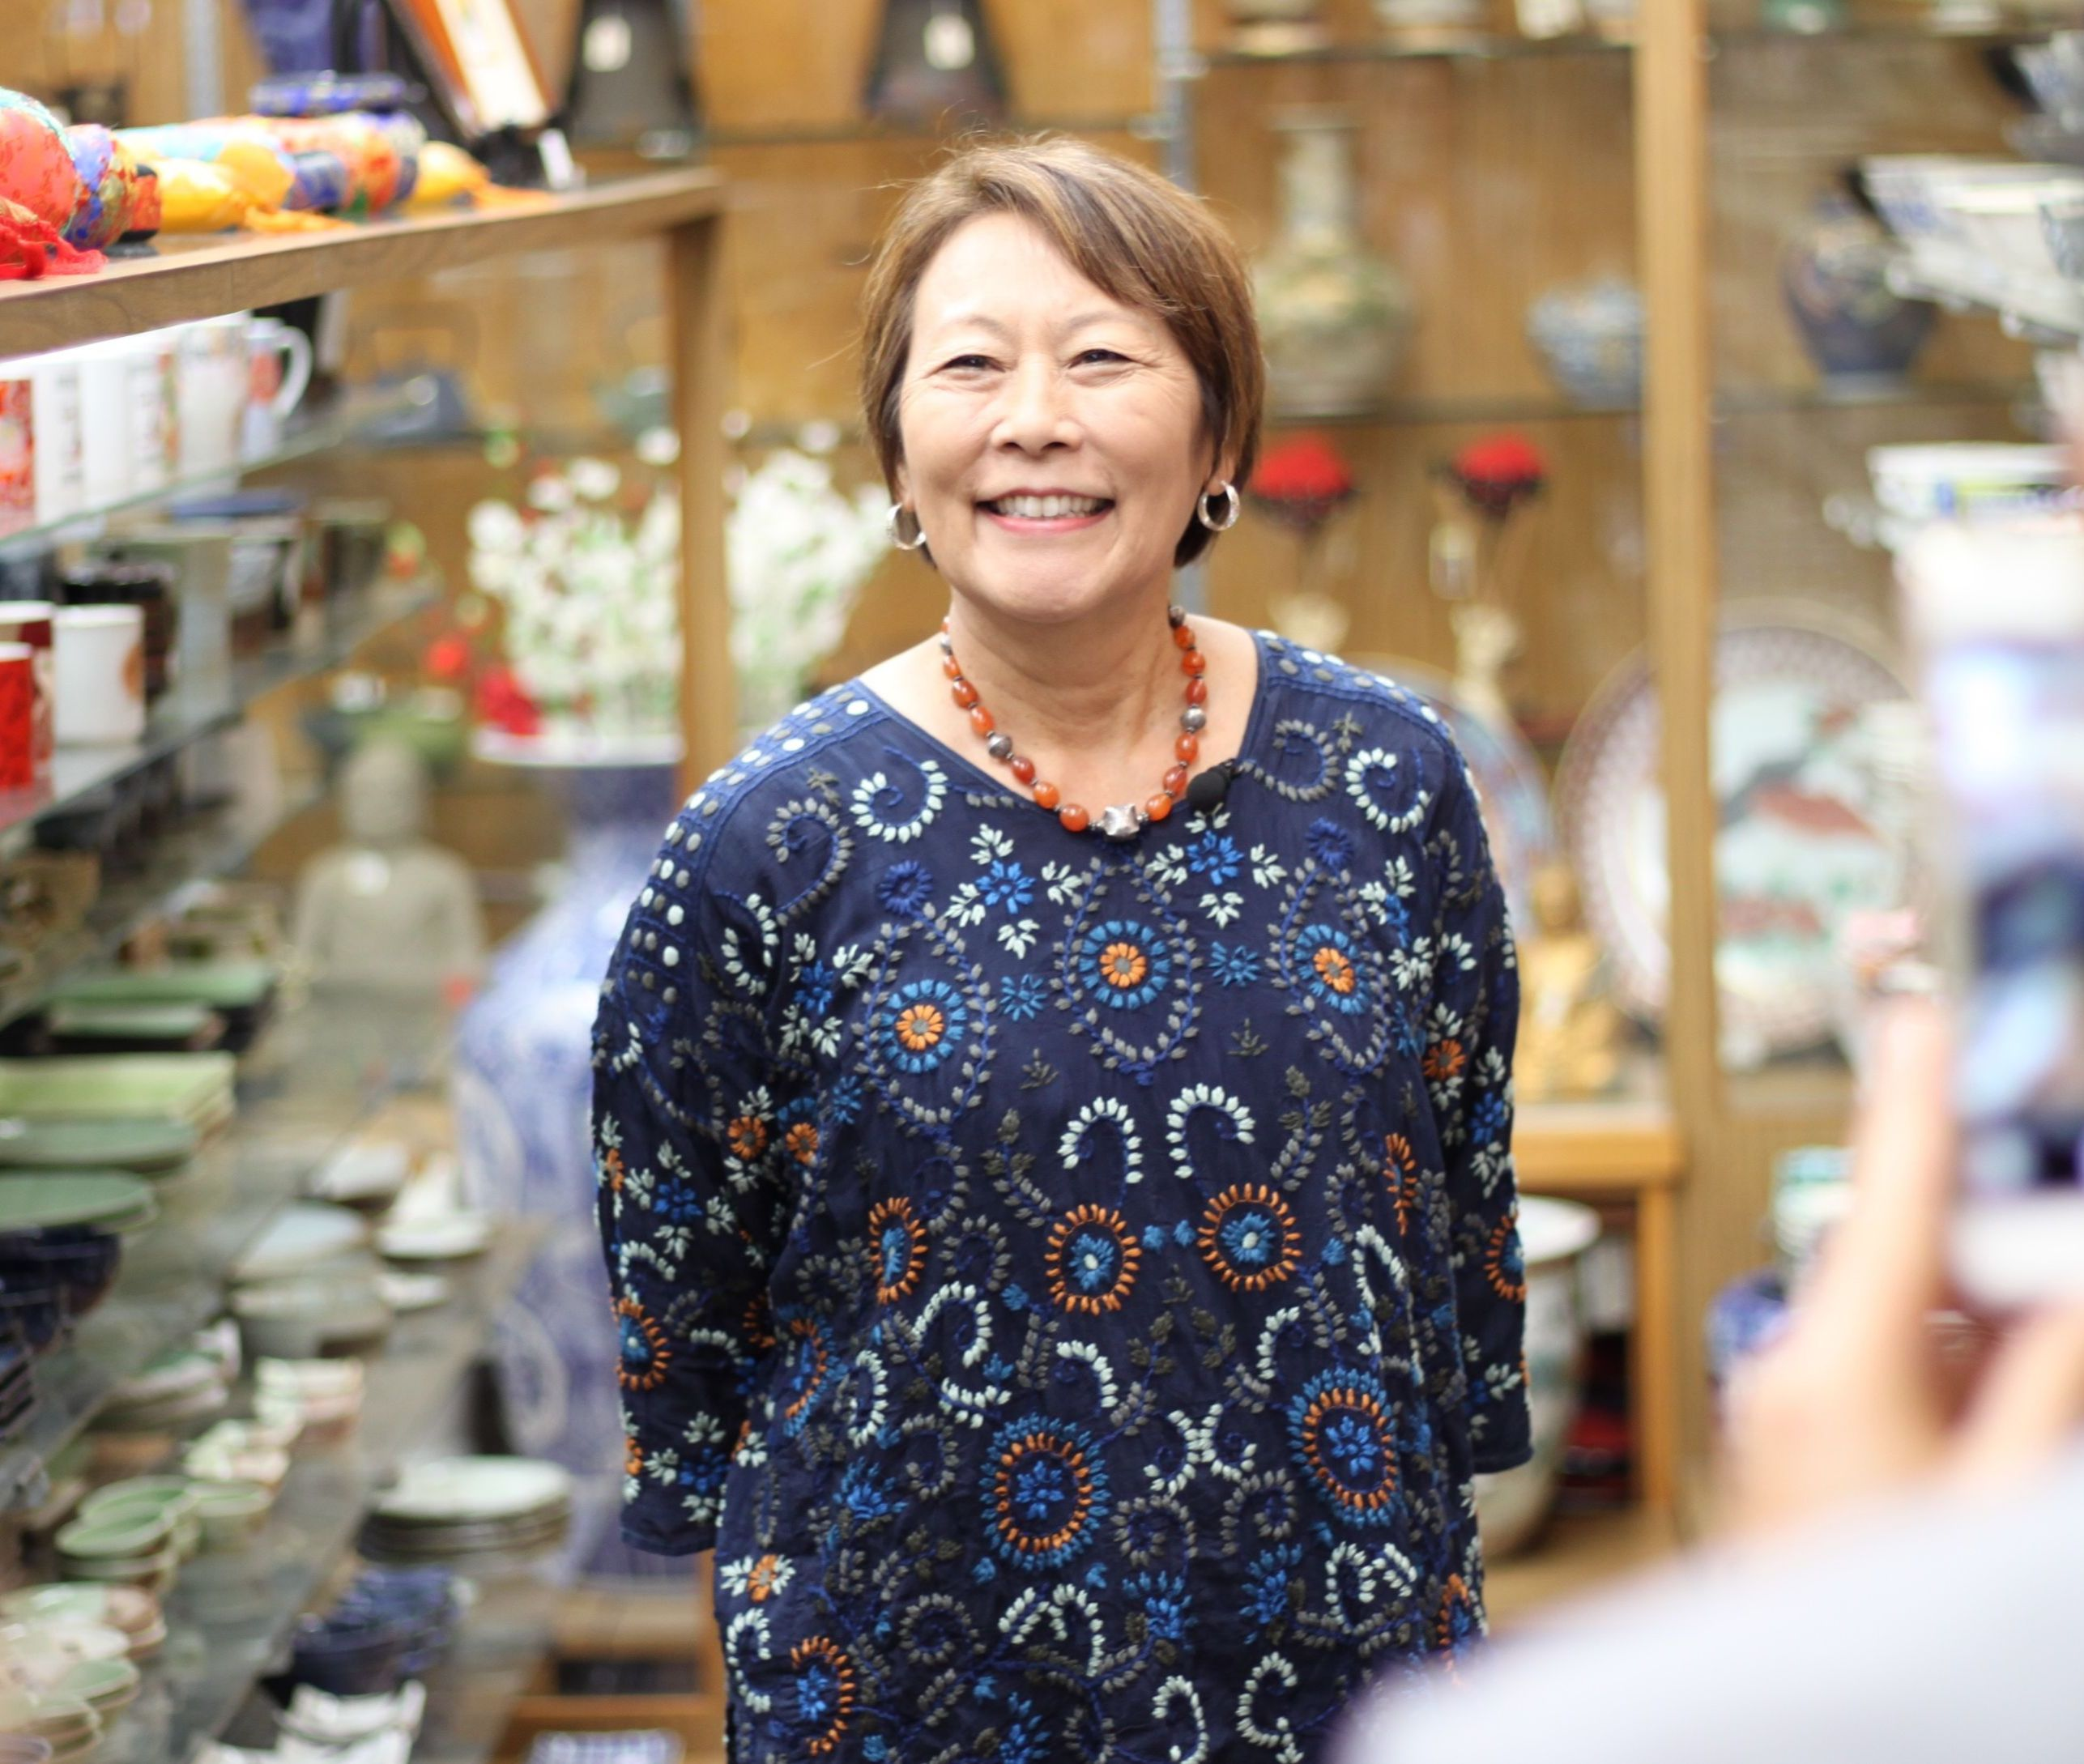 Irene Simonian, owner of Bunkado stands in her store